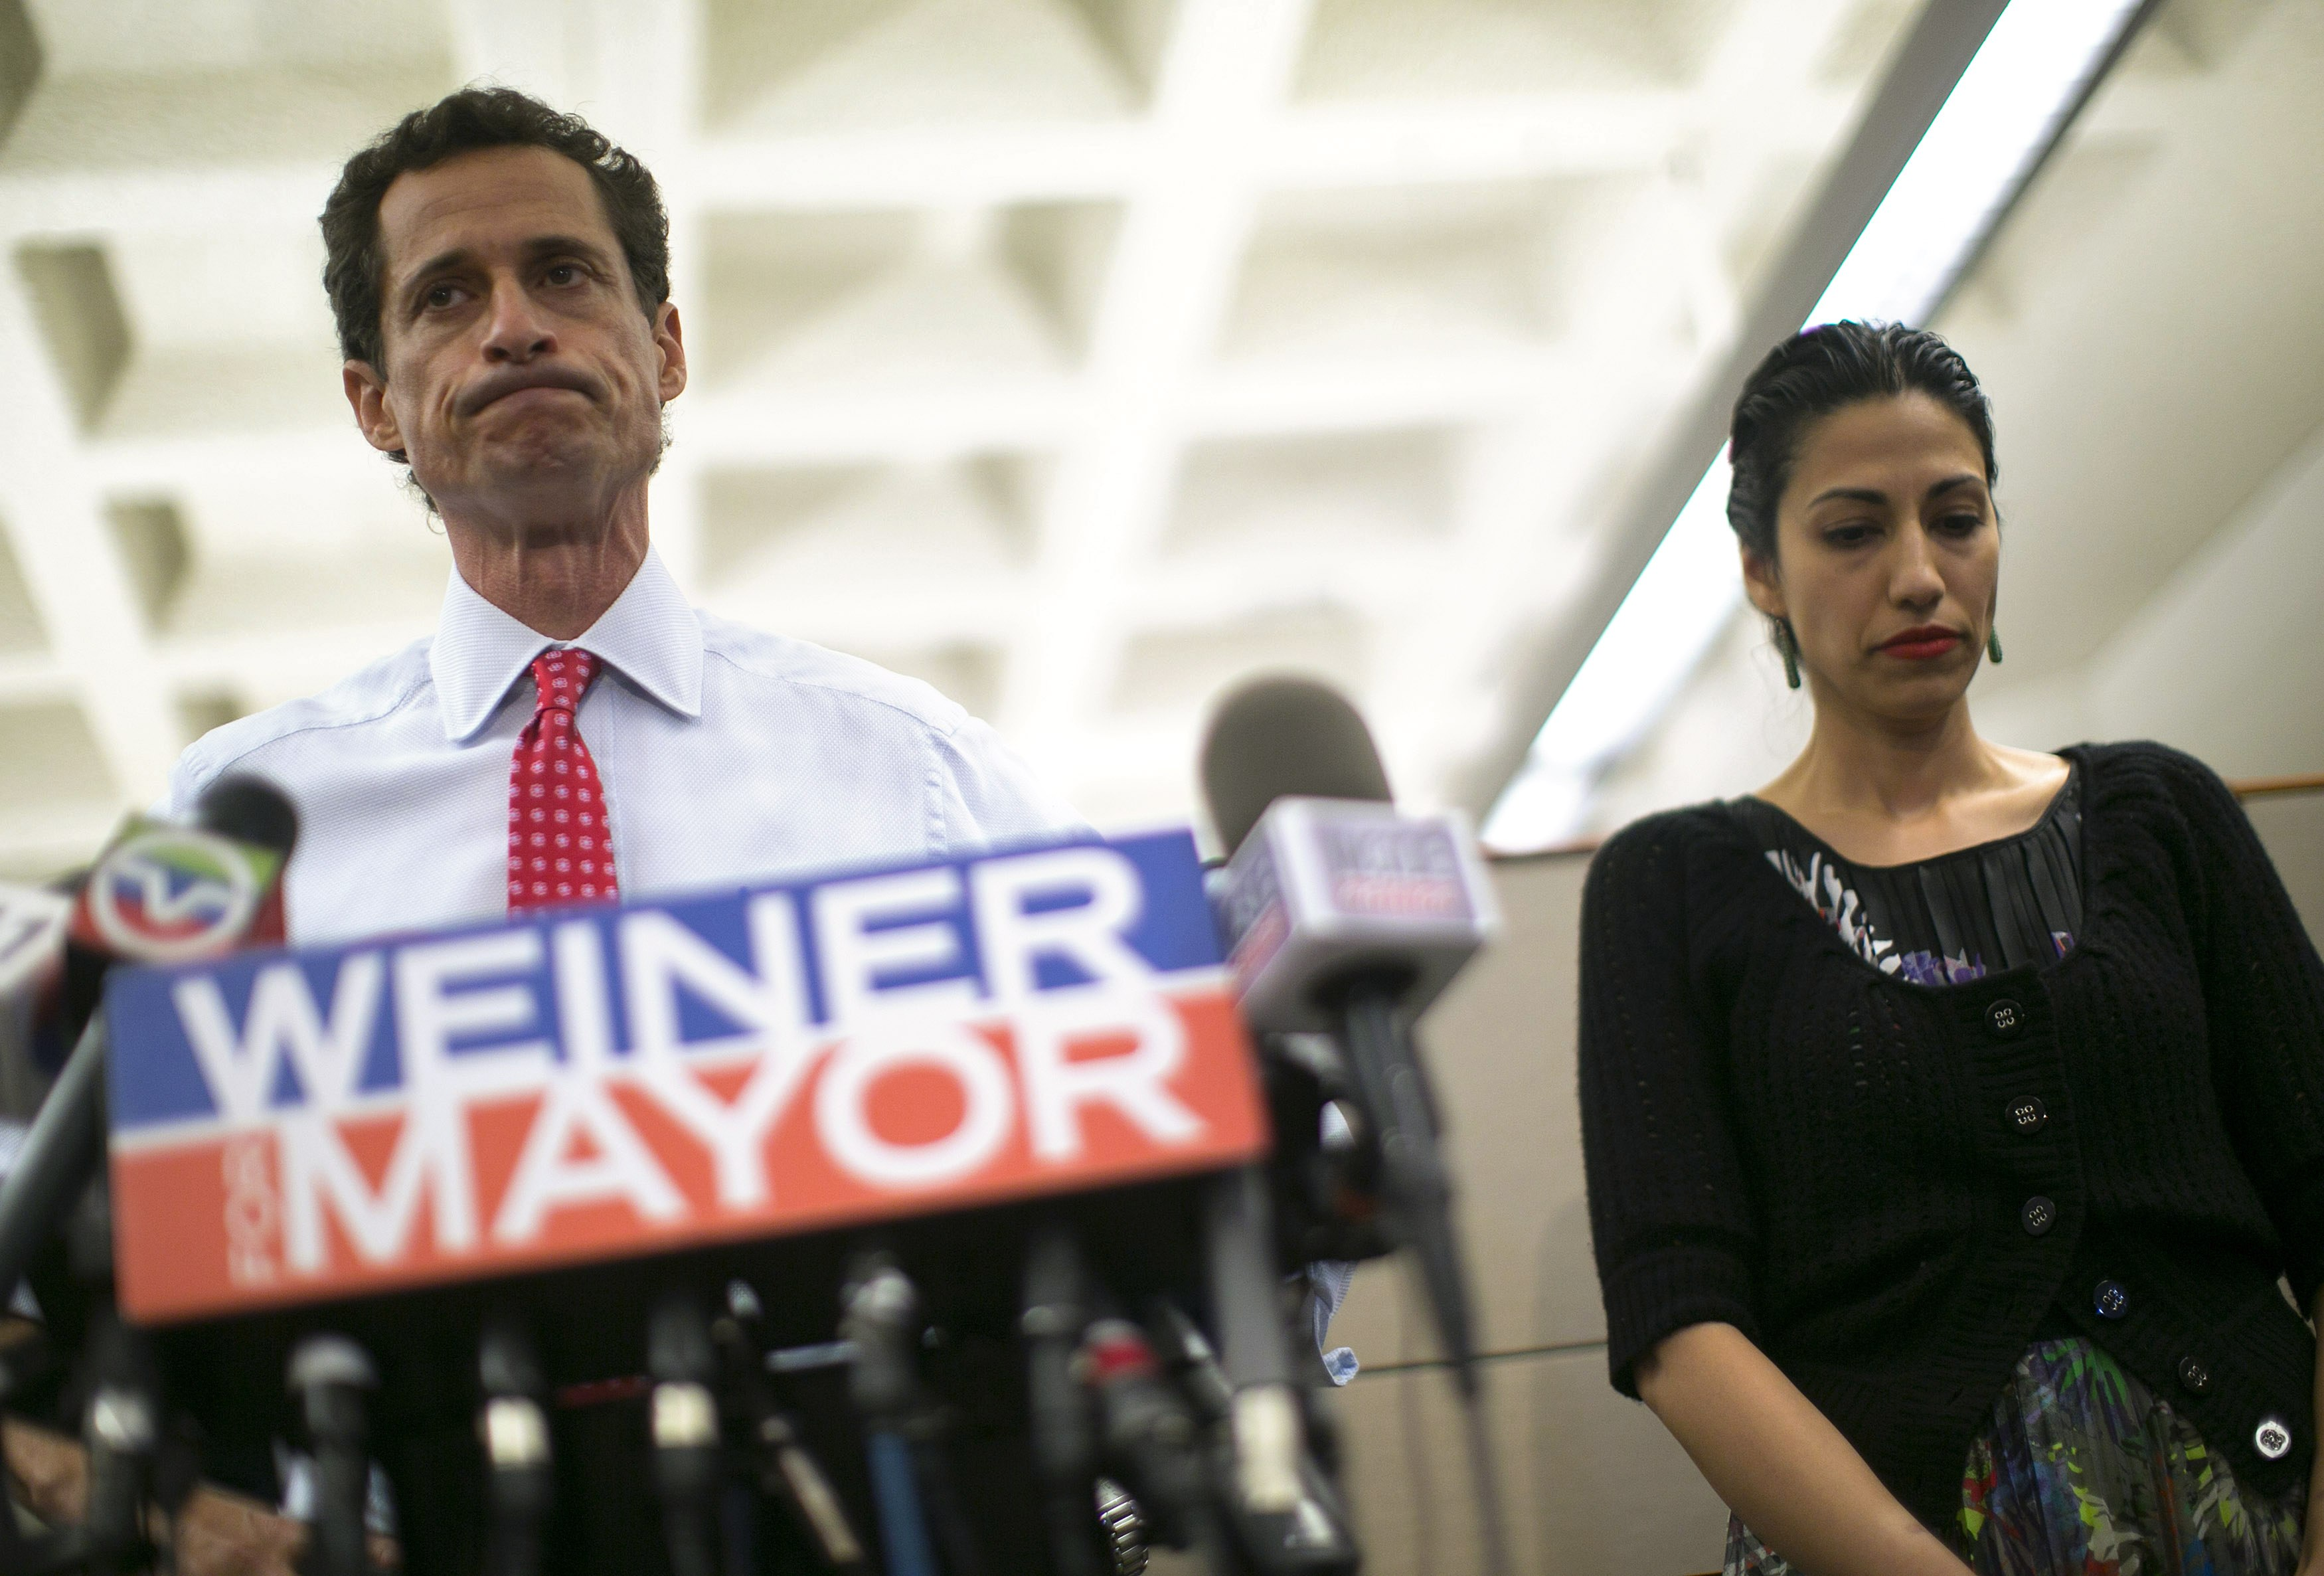 WYSK: Diaz Calls On ACS to Investigate Anthony Weiner and Huma Abedin